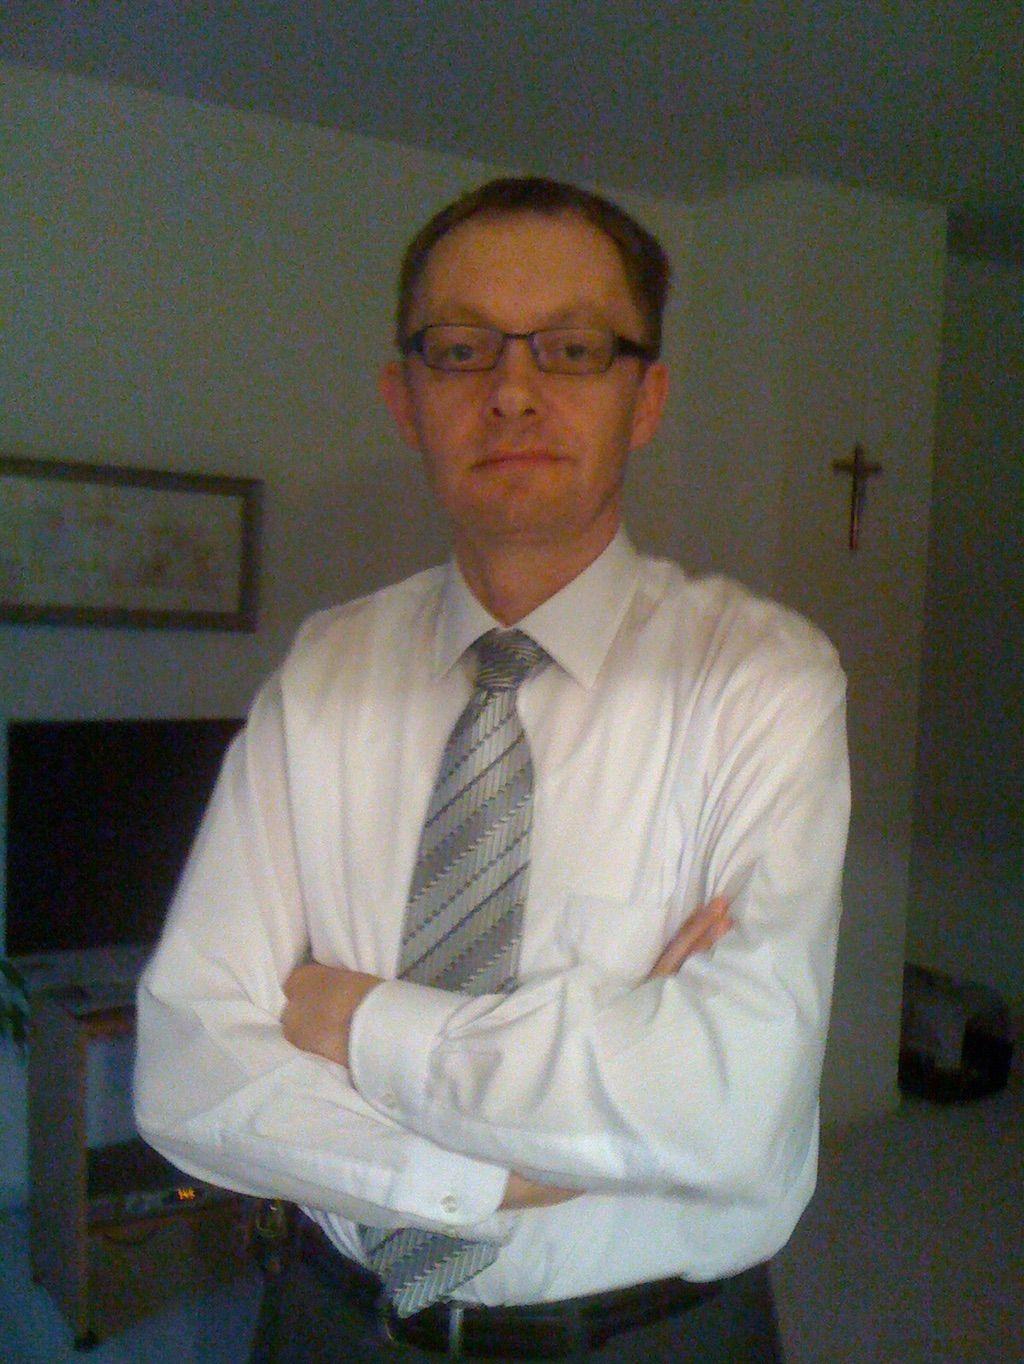 Roland Bender dba Soup2Nuts Language Services